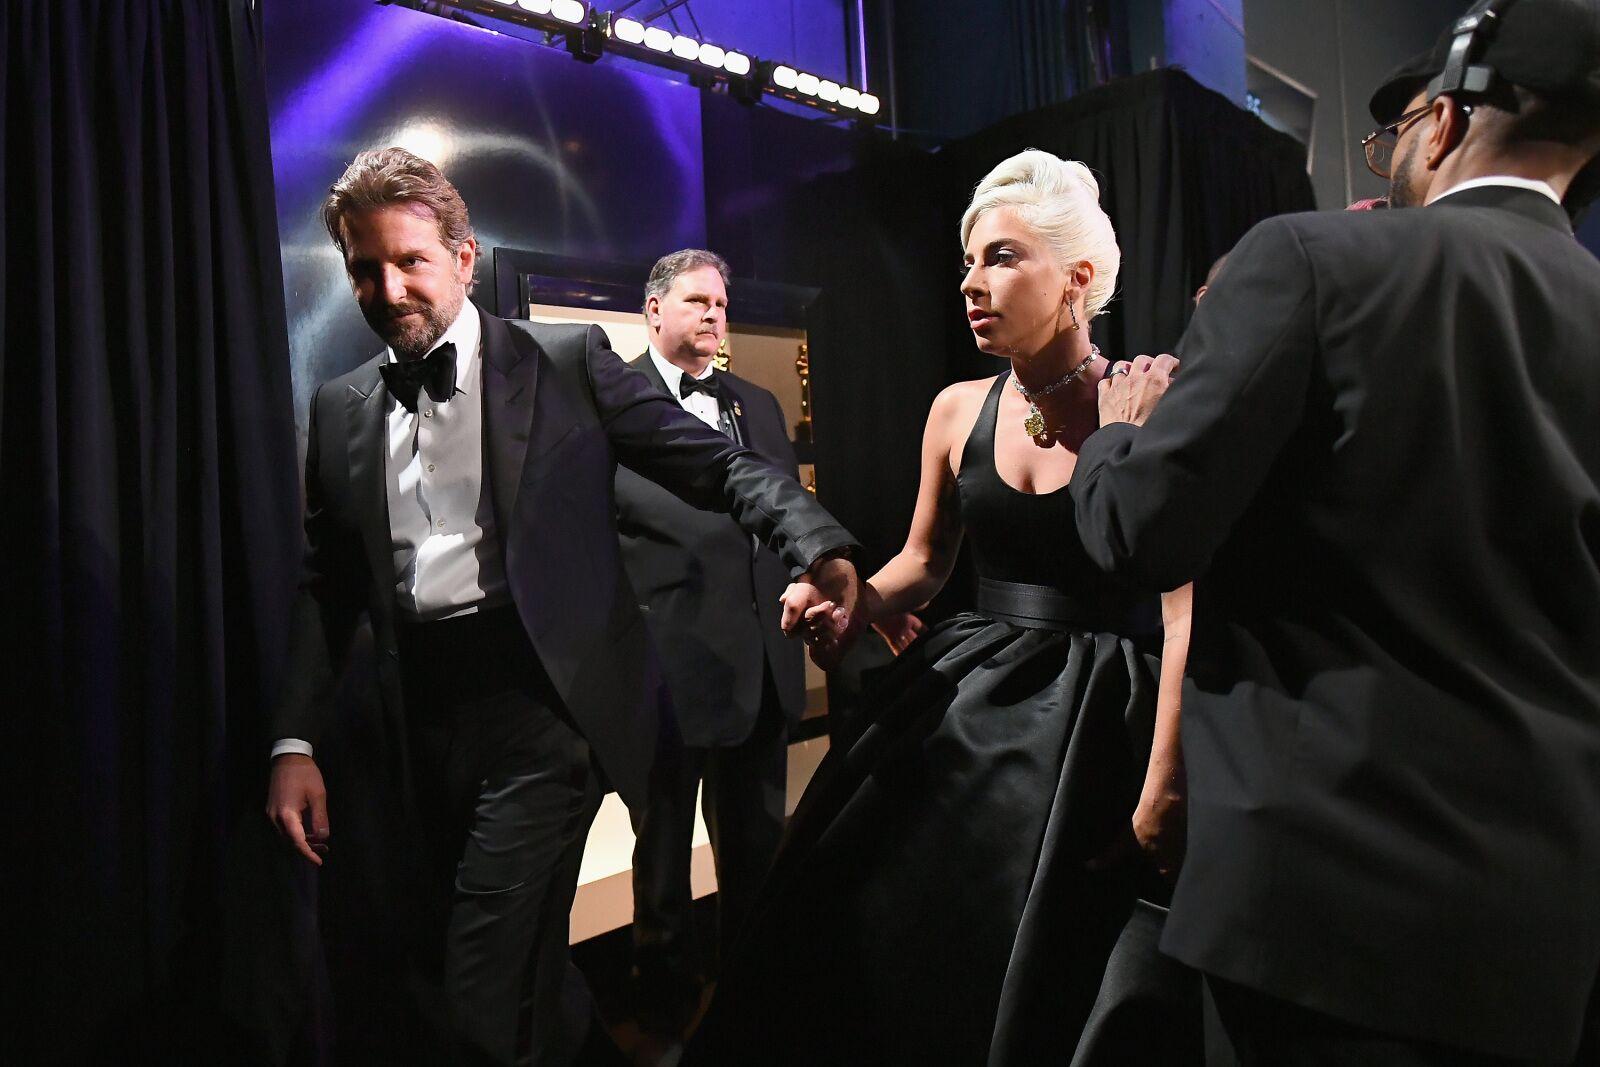 Bradley Cooper, Lady Gaga relationship just got weirdly like Brad Pitt, Angelina Jolie